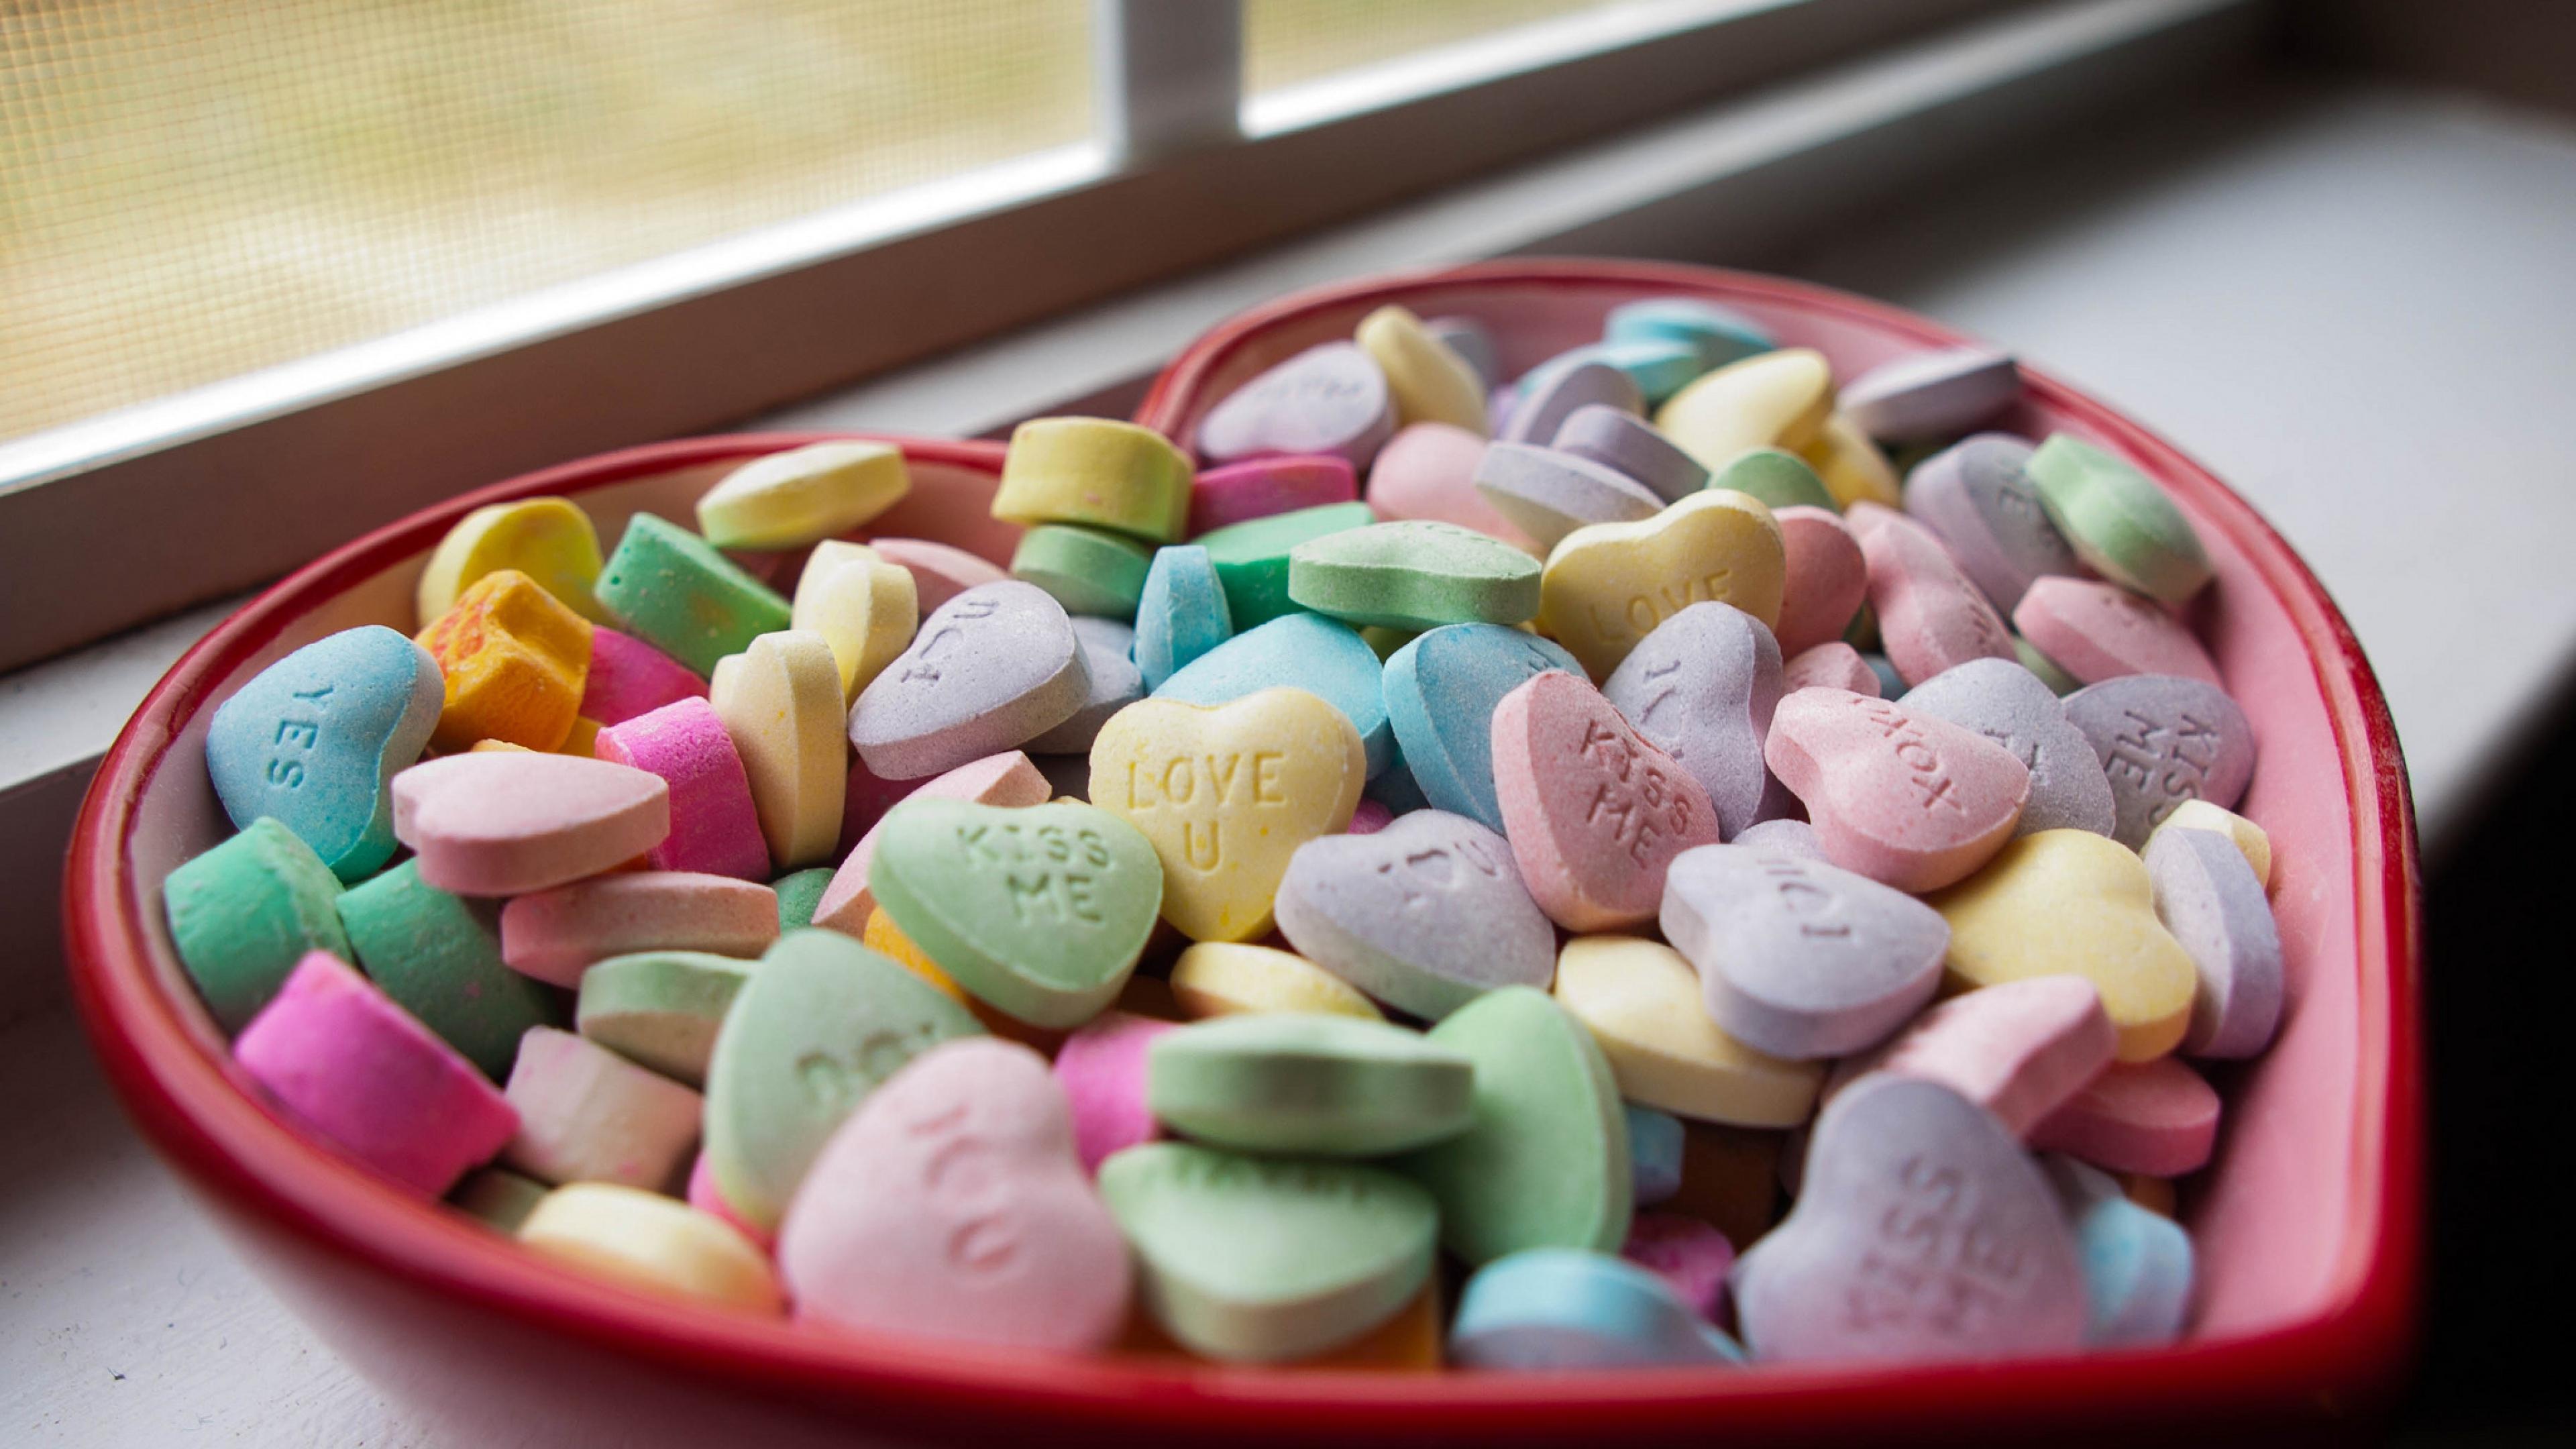 valentine day gifts 4k 1543946263 - Valentine Day Gifts 4k - valentine day wallpapers, heart wallpapers, gift wallpapers, celebrations wallpapers, candy wallpapers